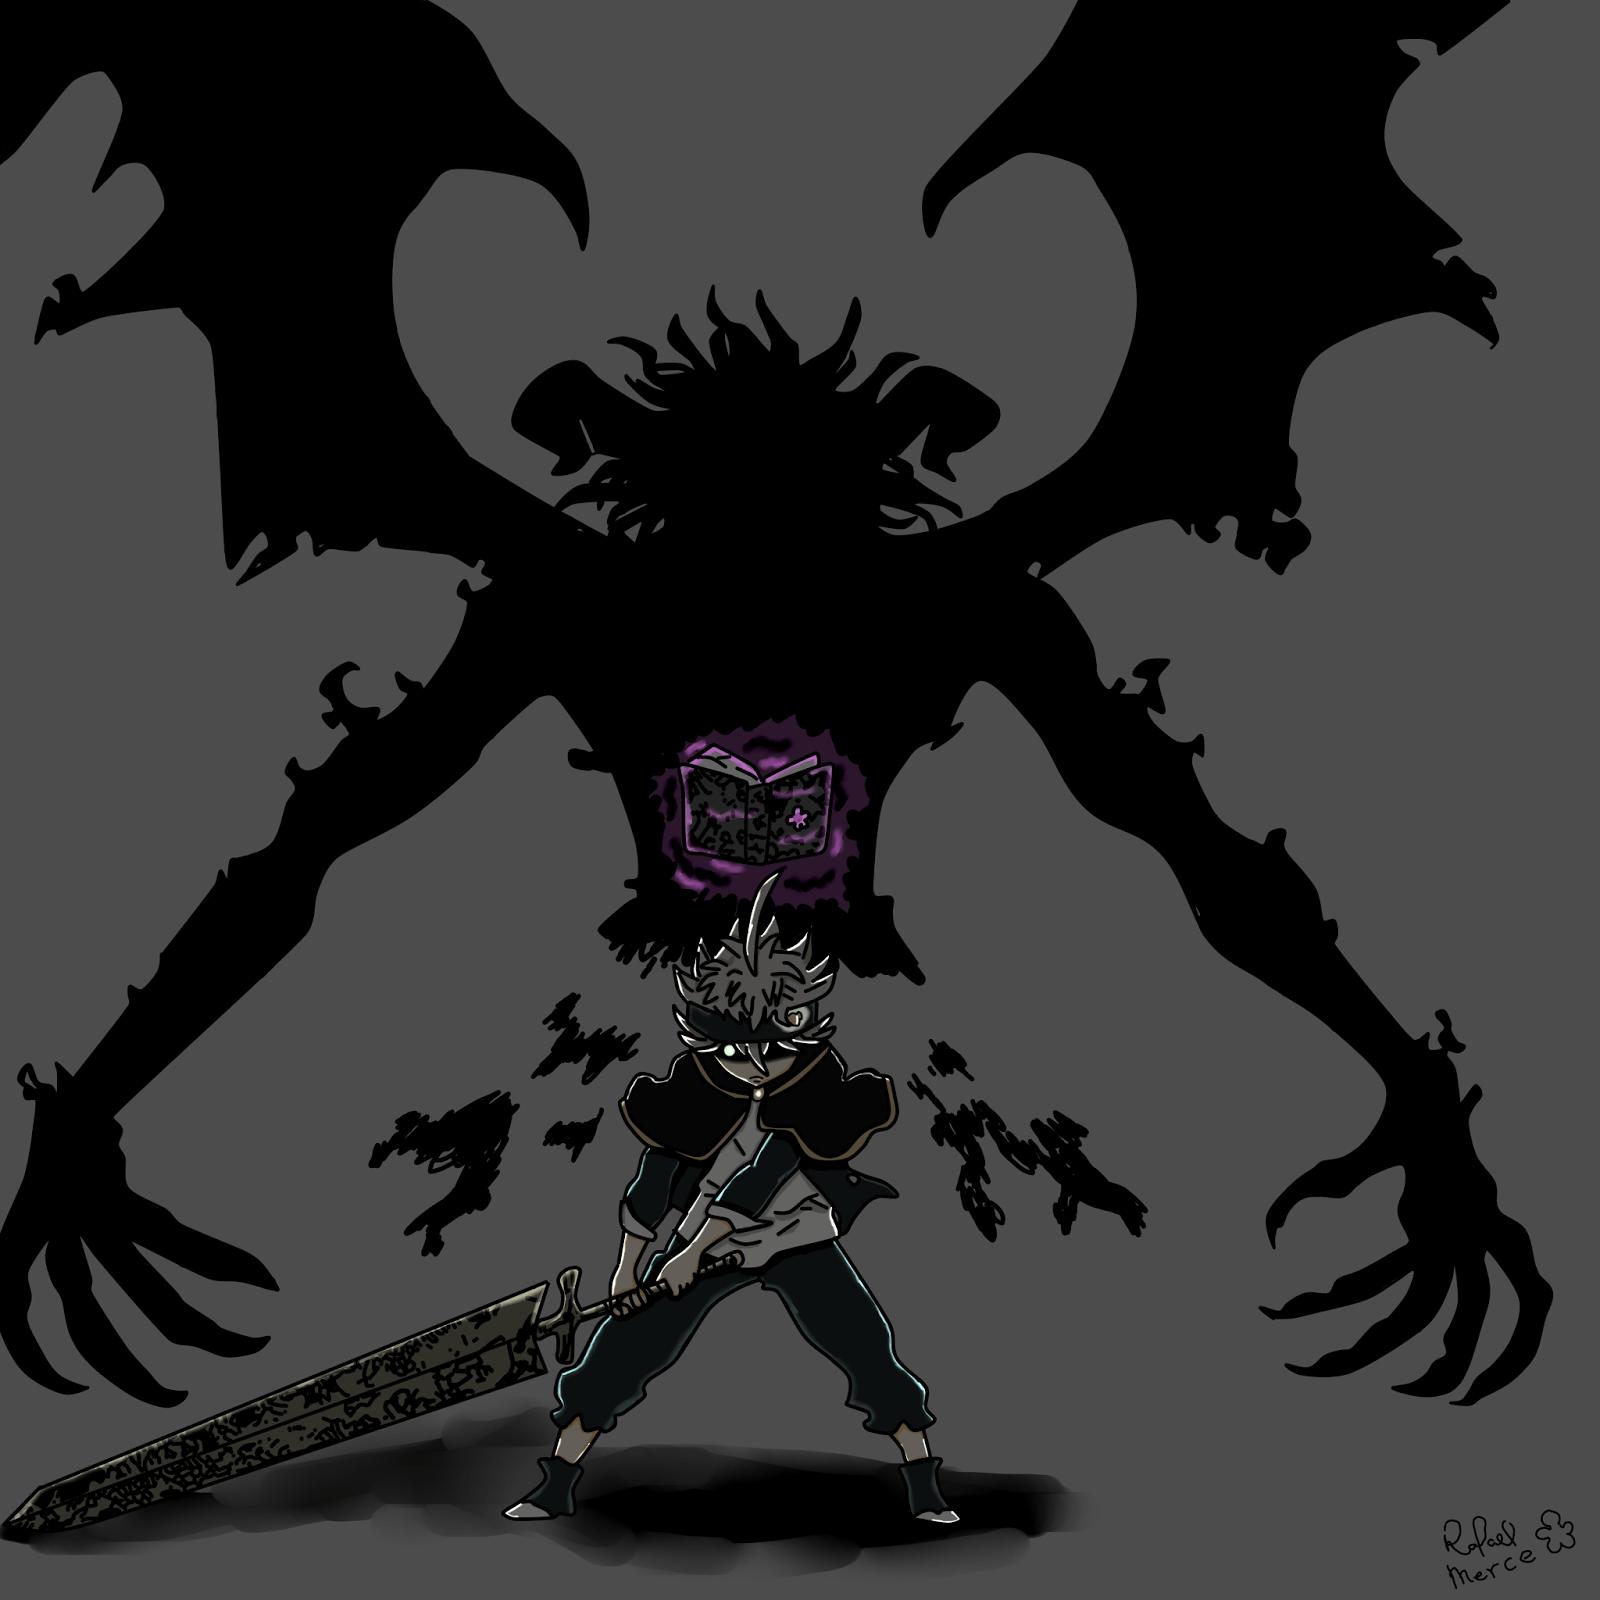 Vanica 「ヴァニカ vanika」 is a member of the spade kingdom's dark triad. Black Clover Iblis Asta Wallpapers - Wallpaper Cave